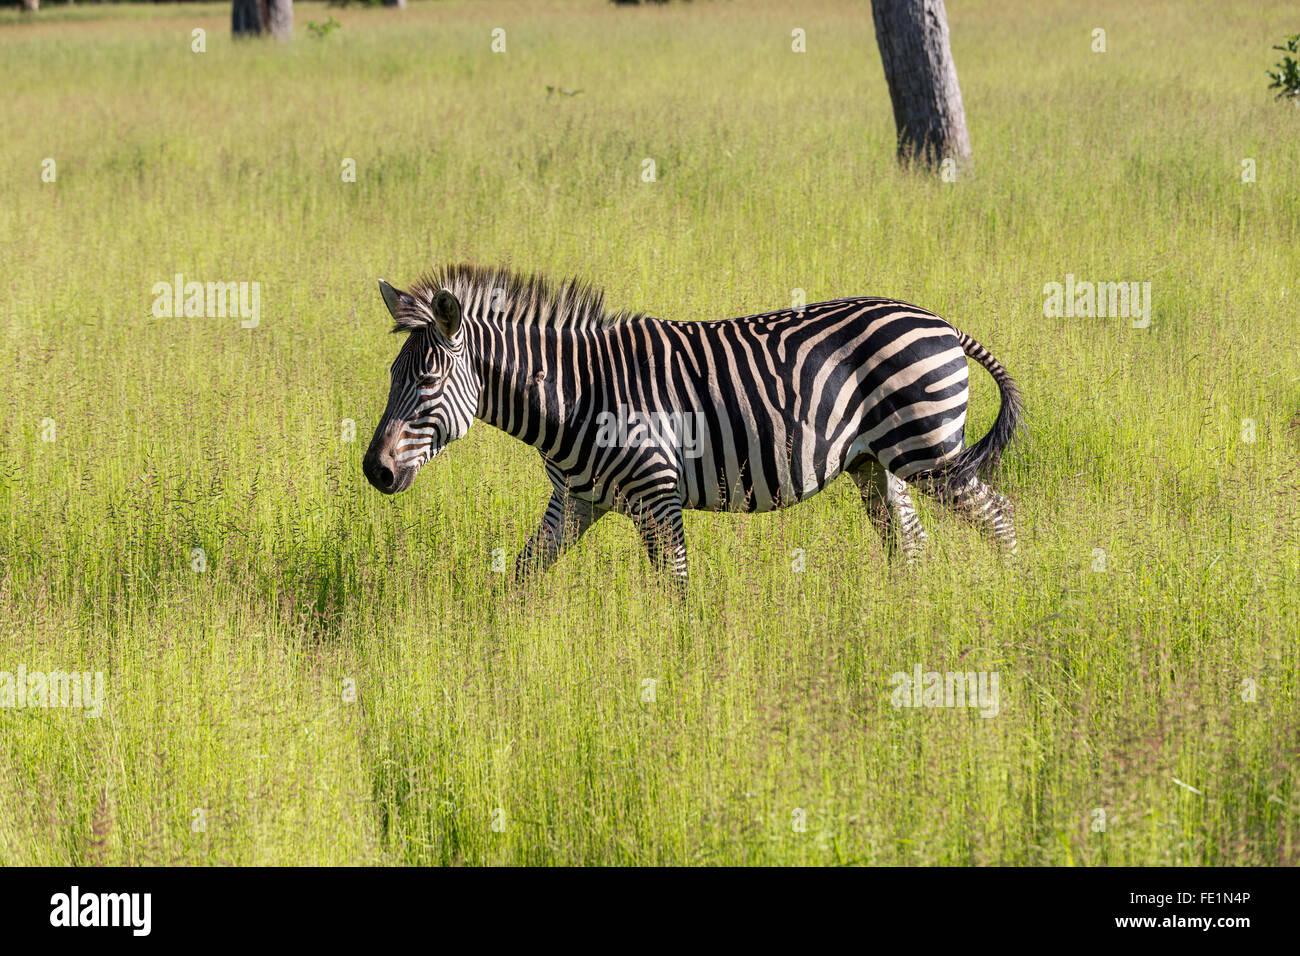 Plains Zebra, South Luangwa National Park, Zambia, Africa - Stock Image